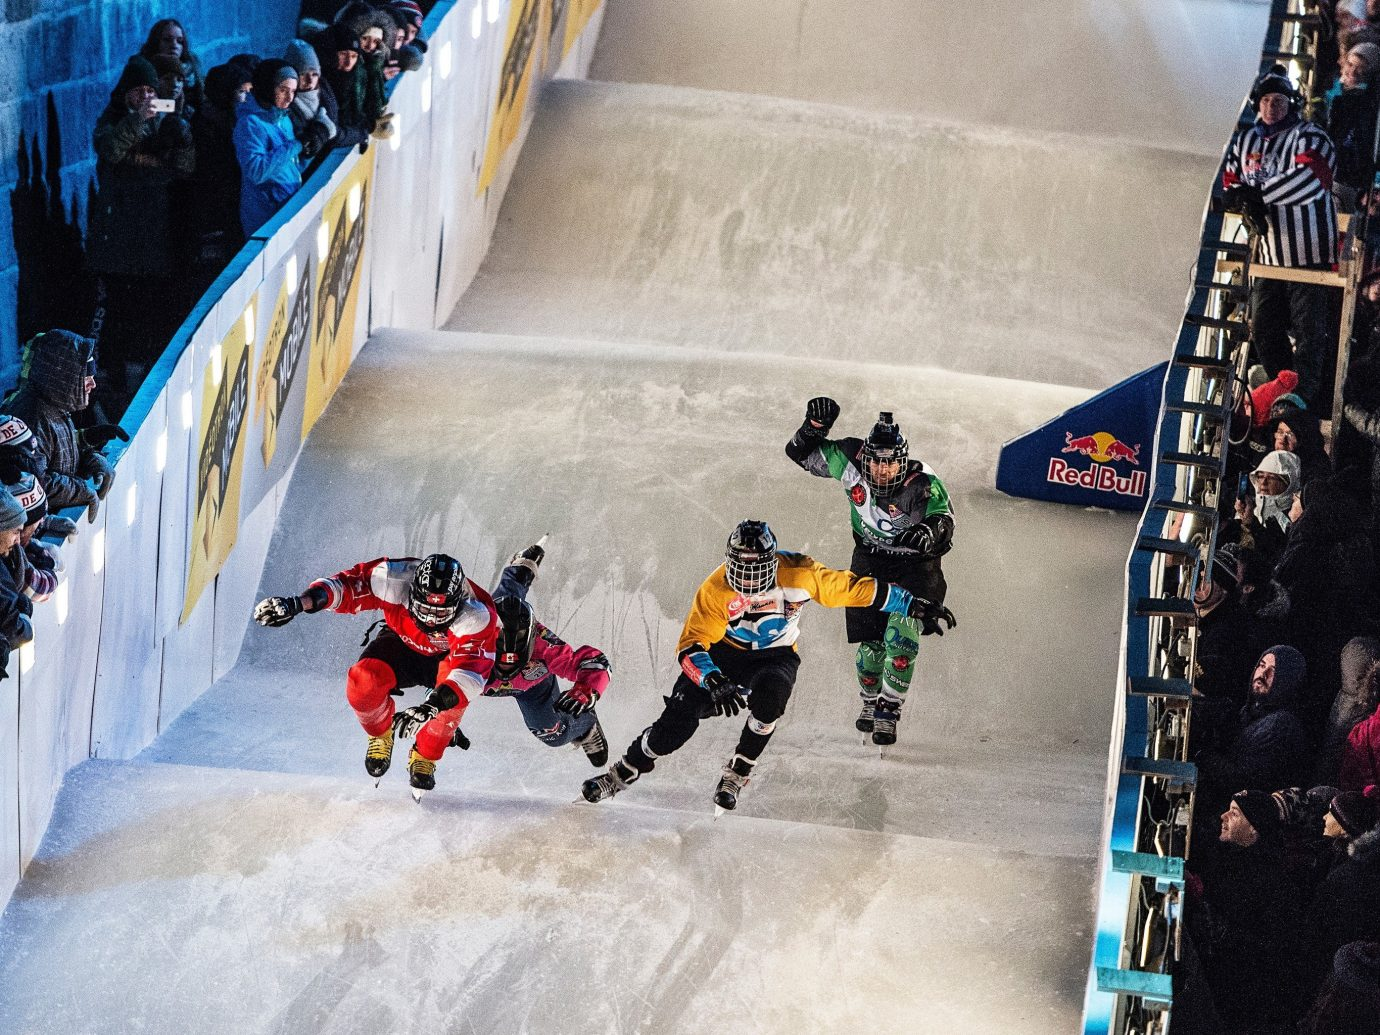 Offbeat Trip Ideas Winter footwear snowboard fashion winter sport sports sports equipment world Ice Skating skating